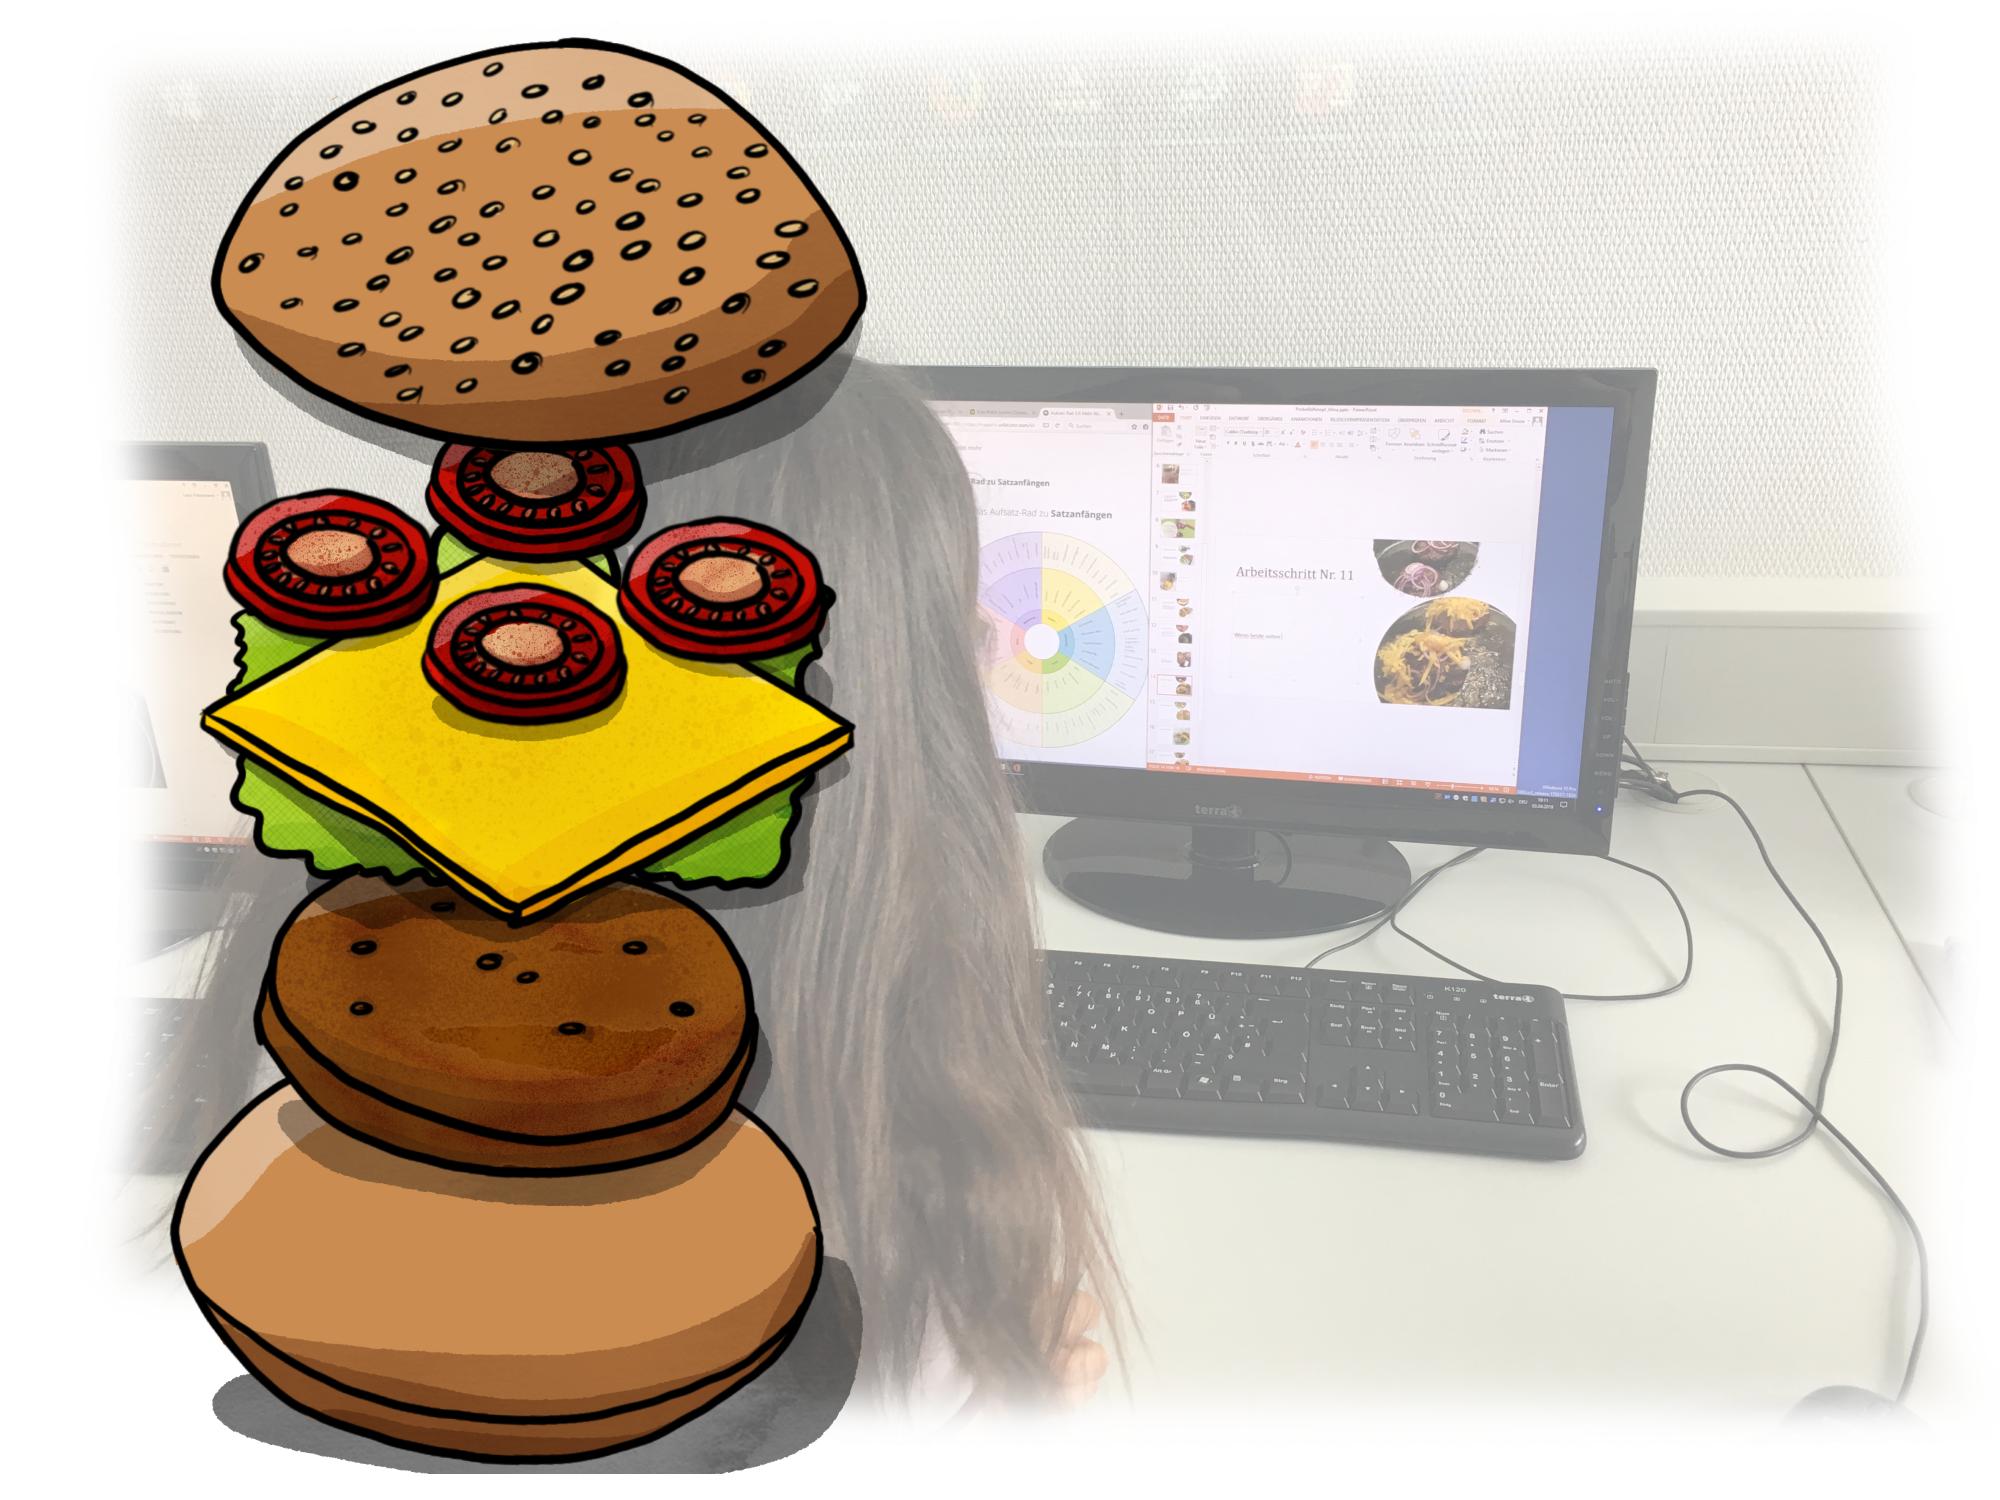 Leckere Cheeseburger mit Barbecuesauce